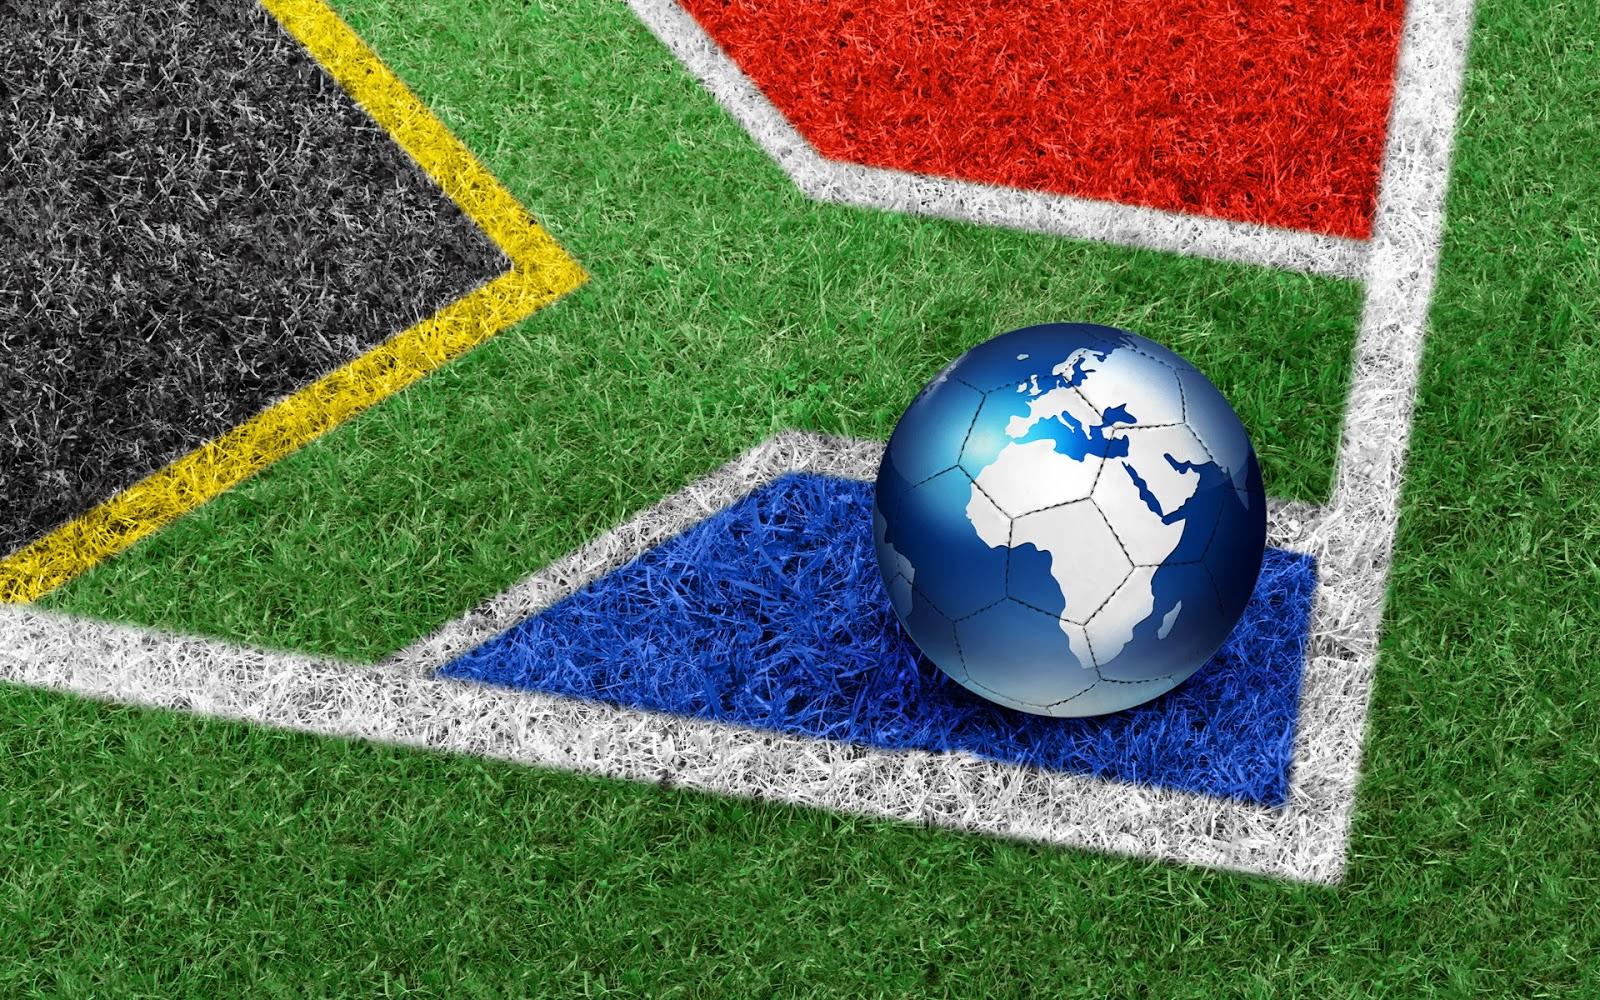 "<img src=""http://4.bp.blogspot.com/-7SgL-LLX2yA/UuEyA_J7LnI/AAAAAAAAJ8A/GtMOseP0rzc/s1600/fifa-soccer-wallpaper.jpg"" alt=""fifa soccer wallpaper"" />"